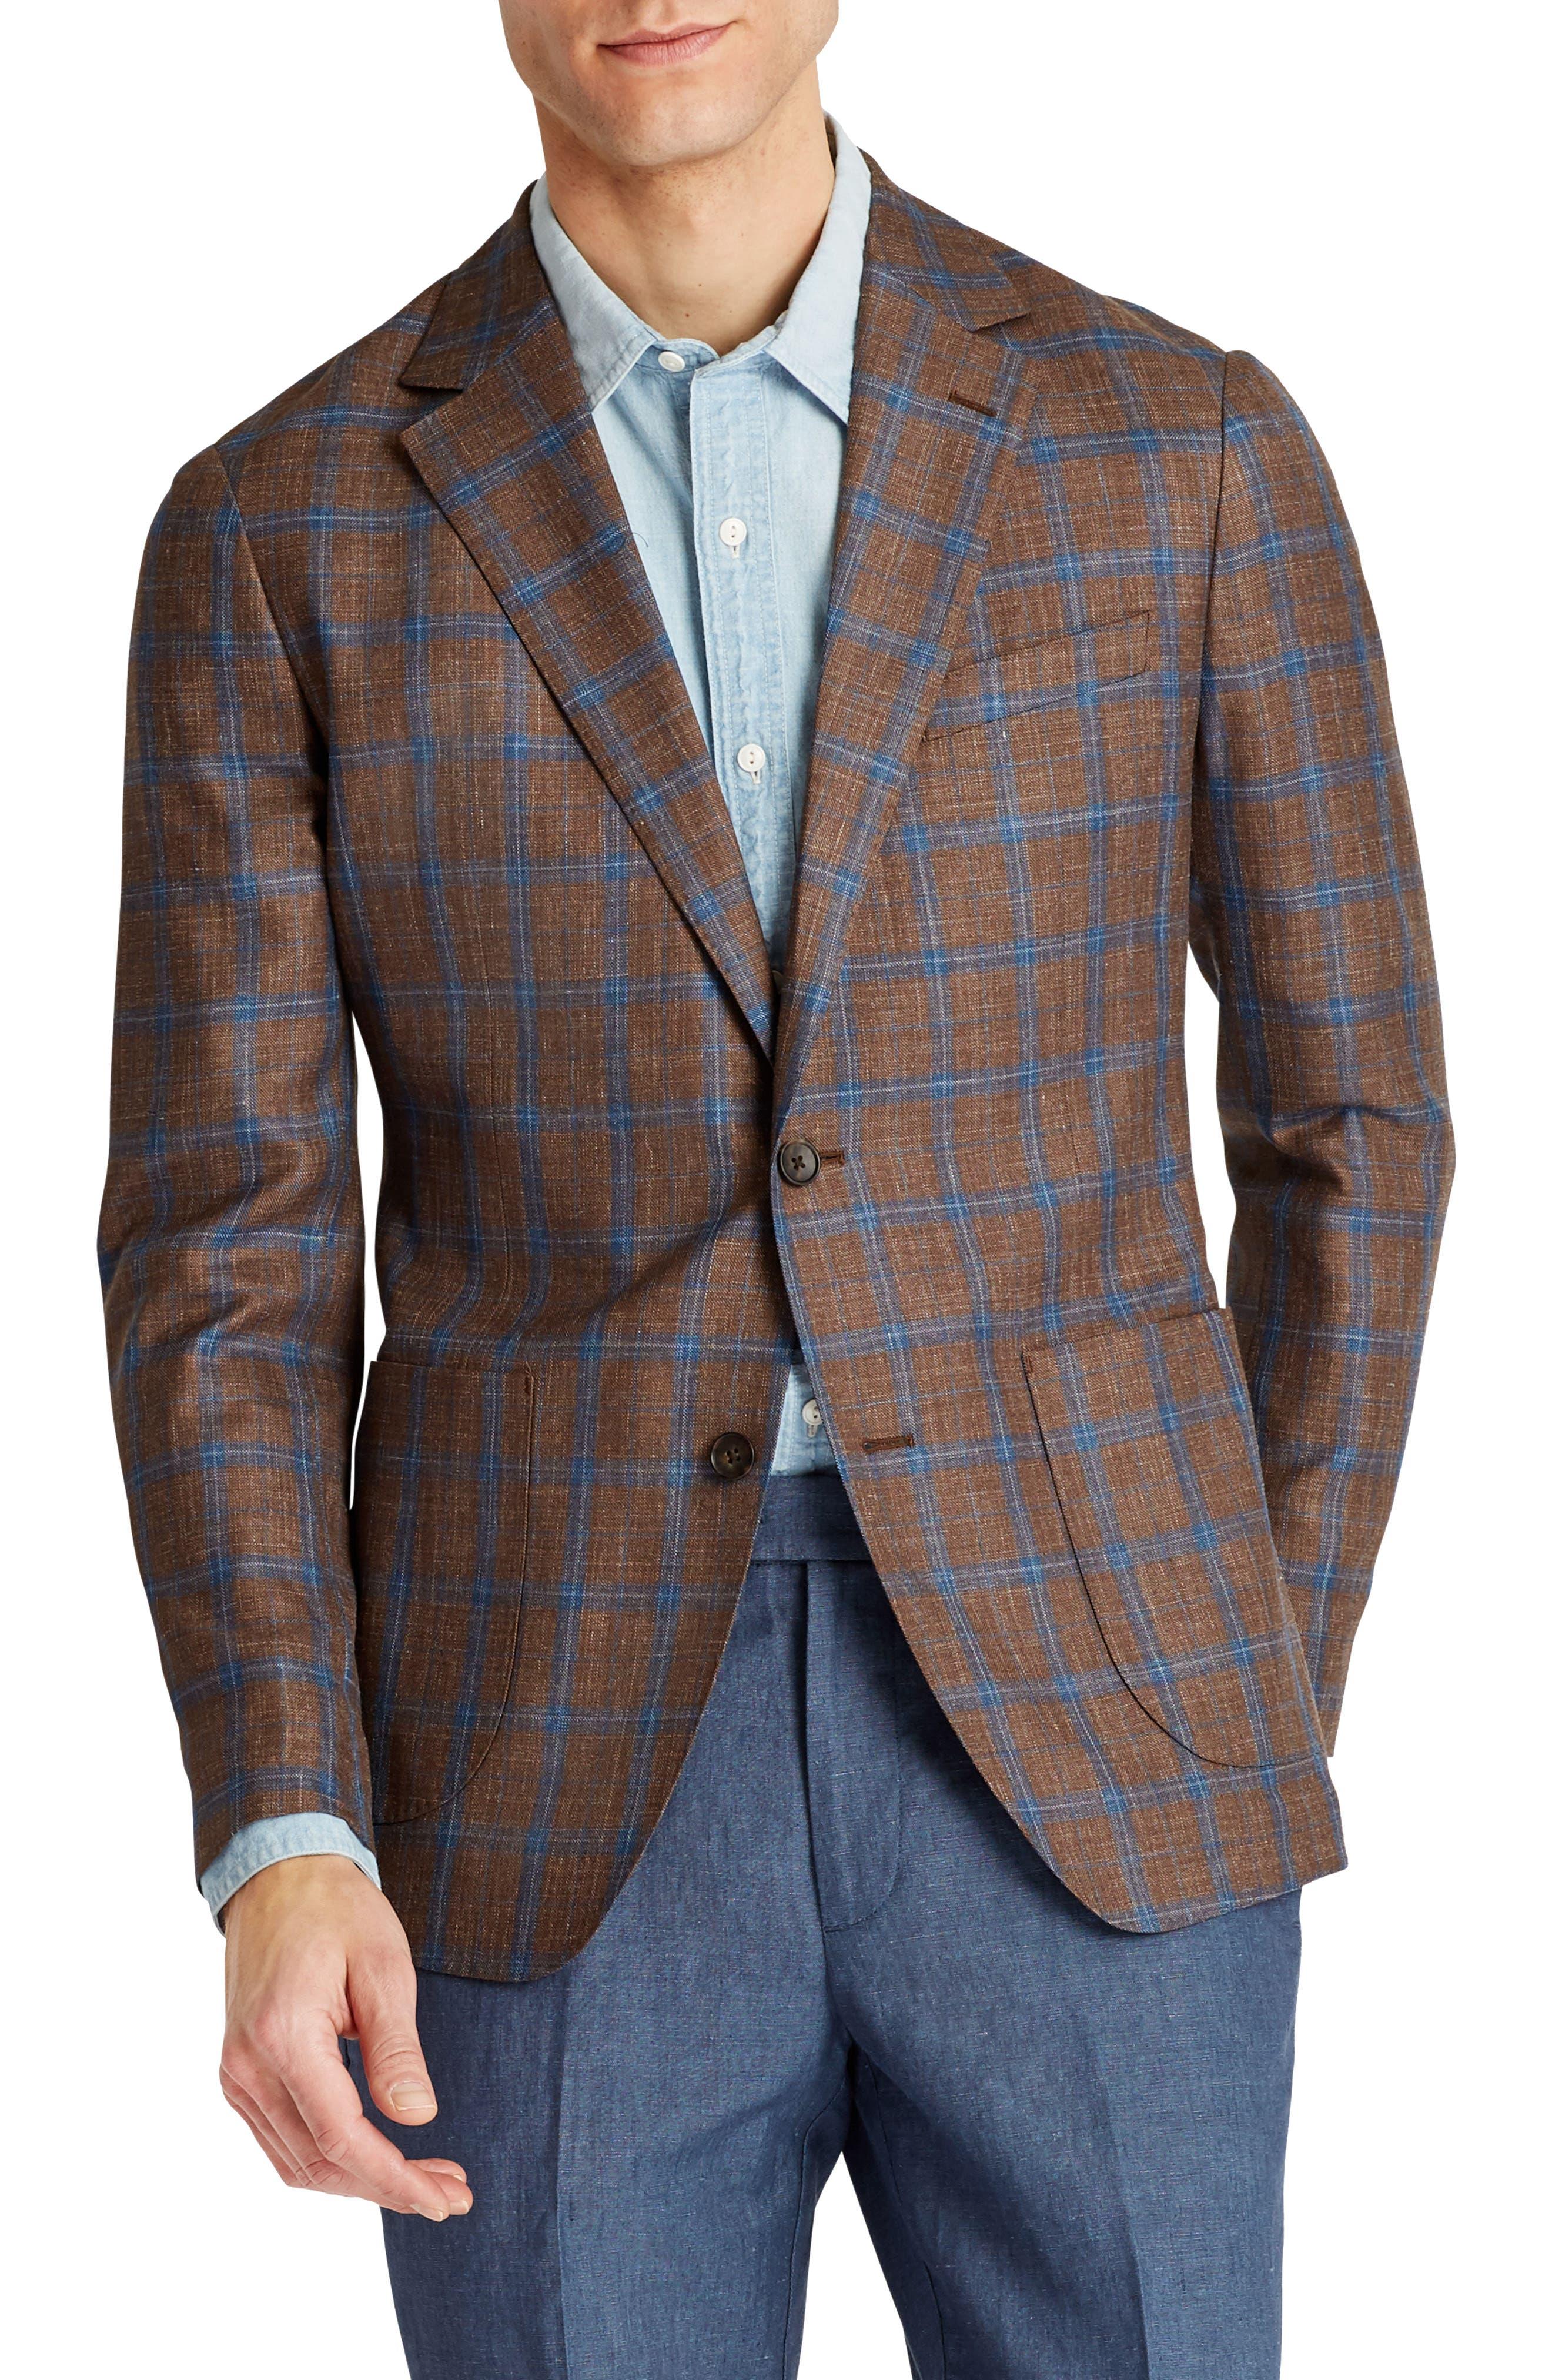 Capstone Slim Fit Plaid Wool Blend Sport Coat,                             Main thumbnail 1, color,                             200